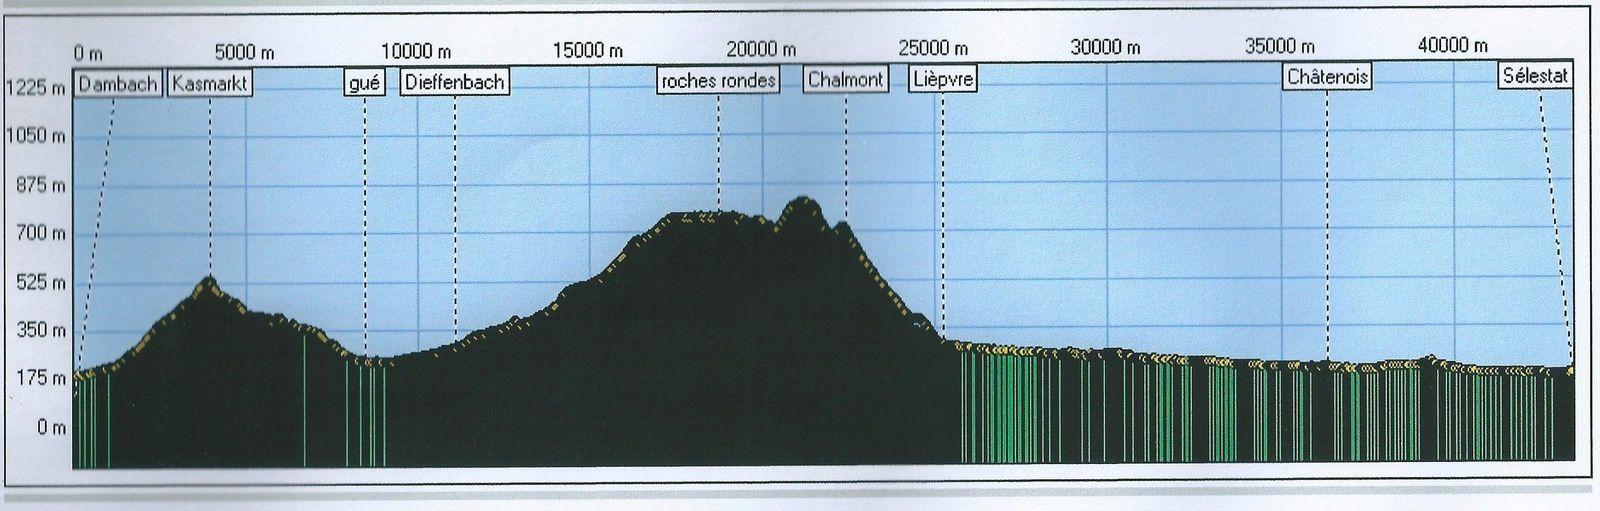 VTT Roches Rondes - 7 juillet 2013